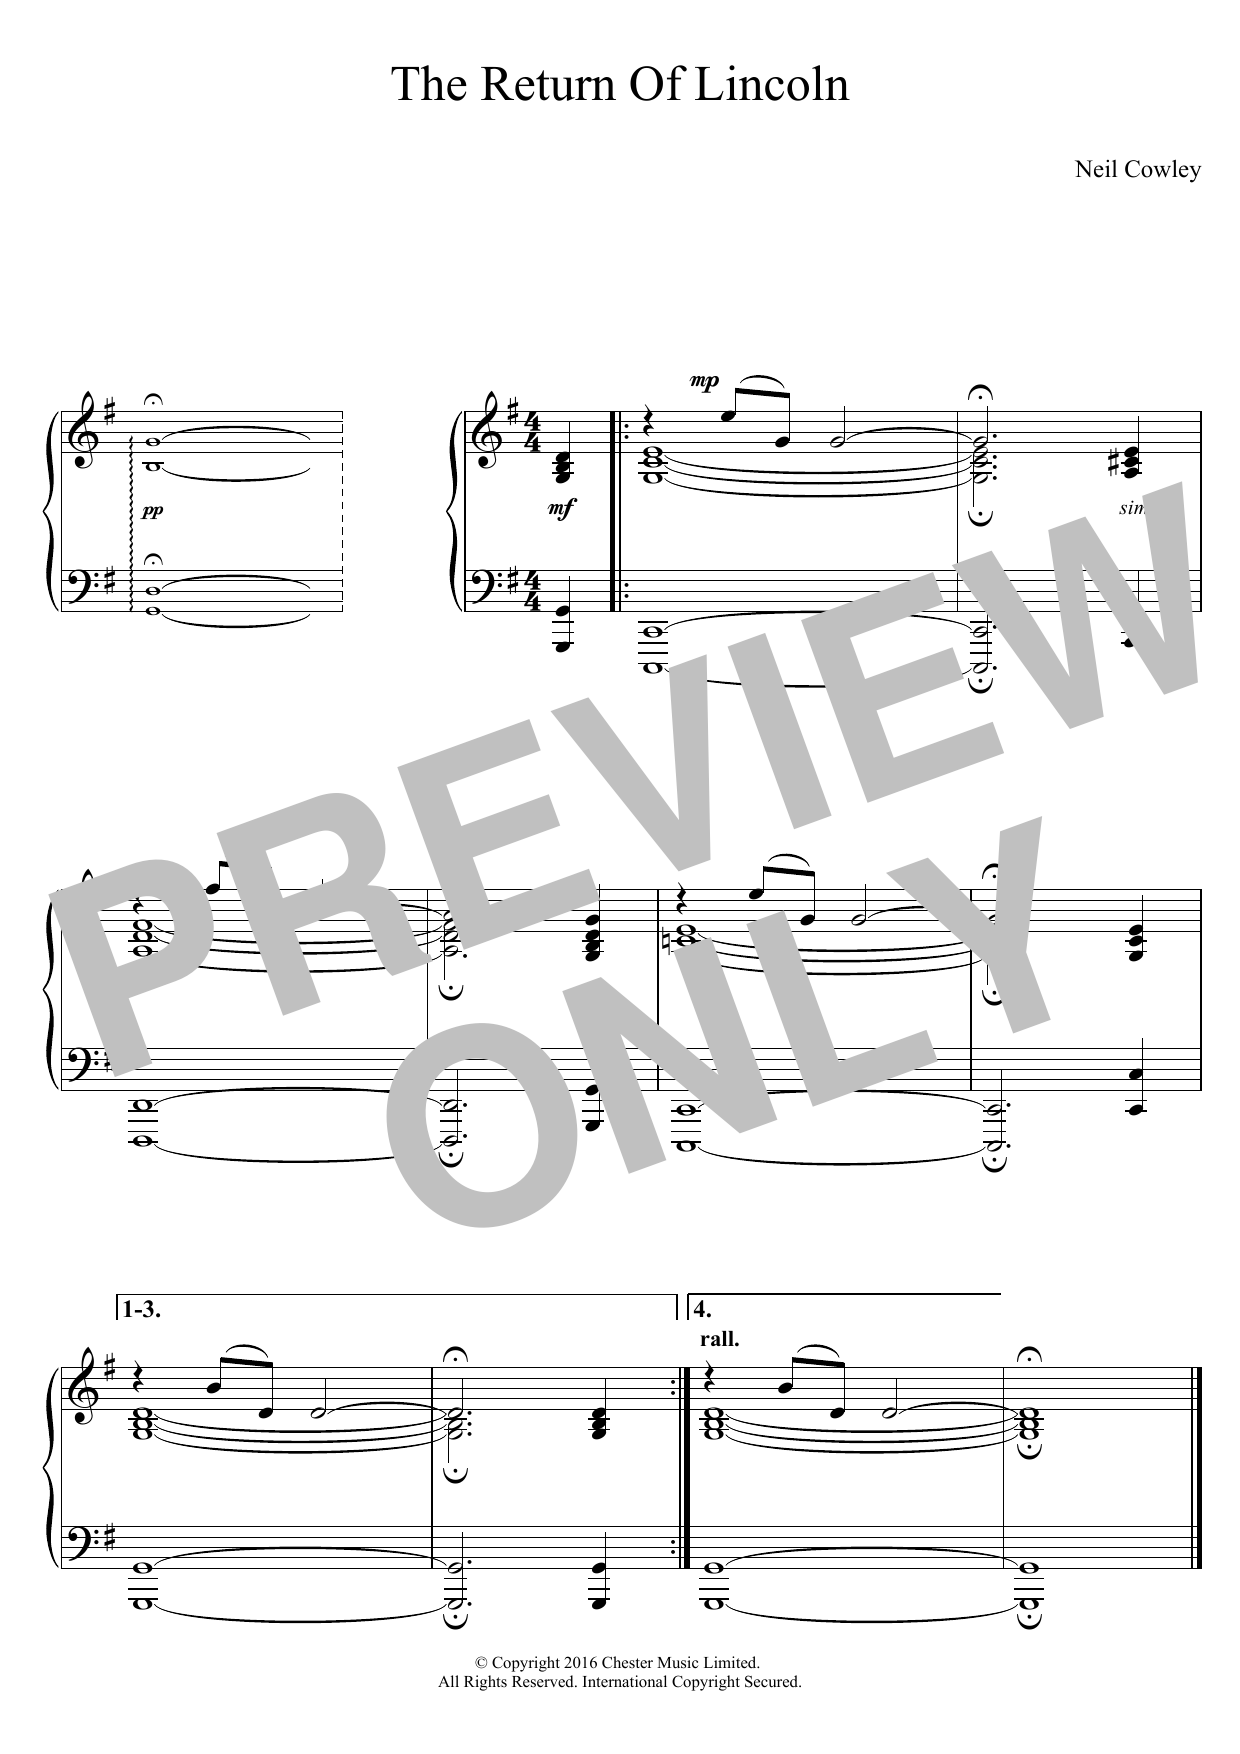 Neil Cowley Trio - The Return Of Lincoln